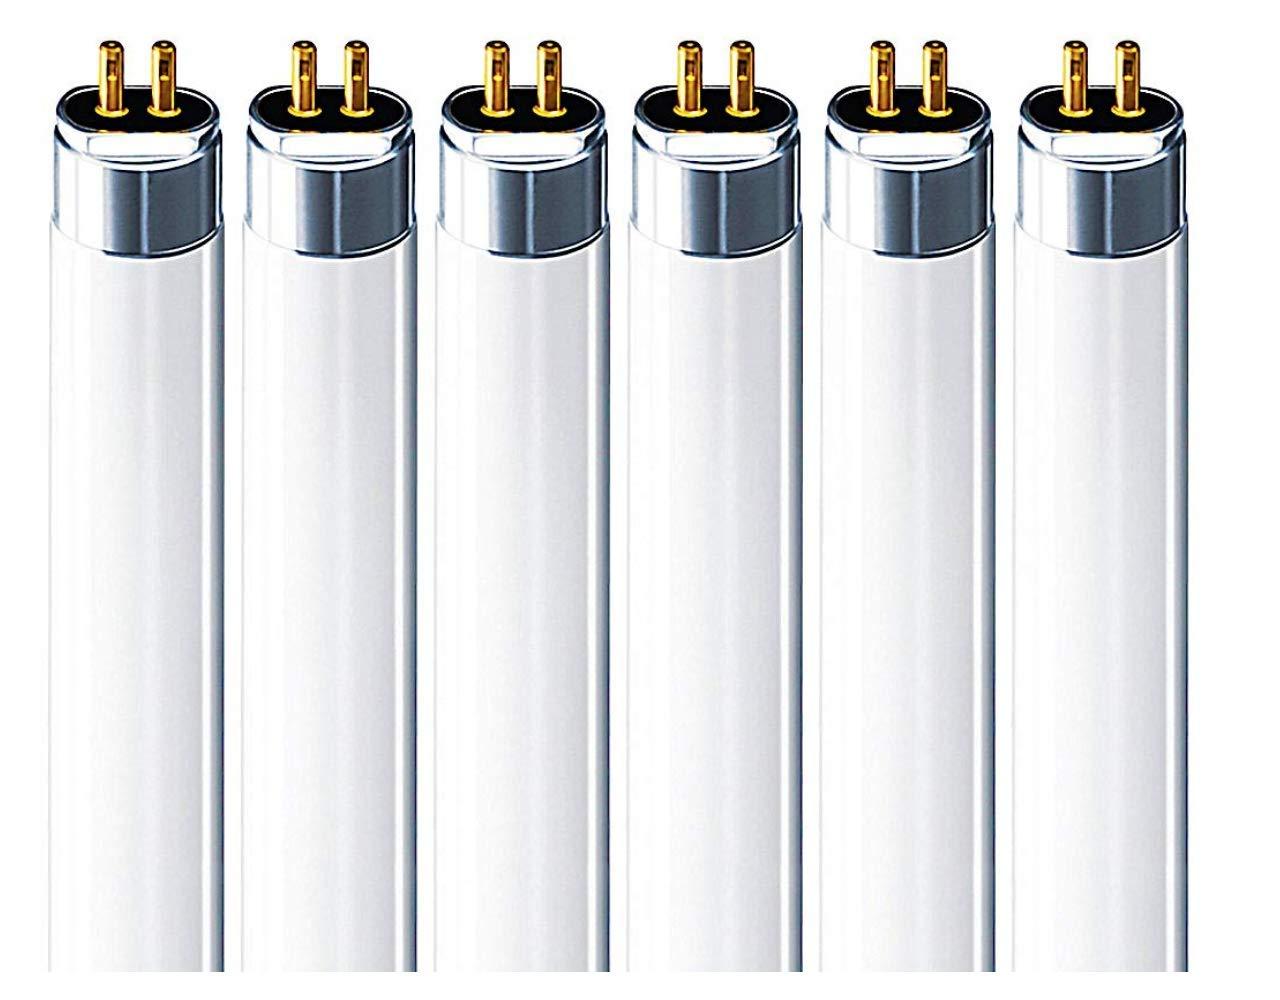 (6 Pack) Sylvania 20197 - FP54/835/HO/XL/ECO 54 Watt T5 HO High Output Fluorescent Tube Light 54W F54T5-3500K Replaces F54T5/HO F54T5/HO/835 F54W/T5/835/ECO FP54/835/HO/ECO F54T5/835/HO/ALTO